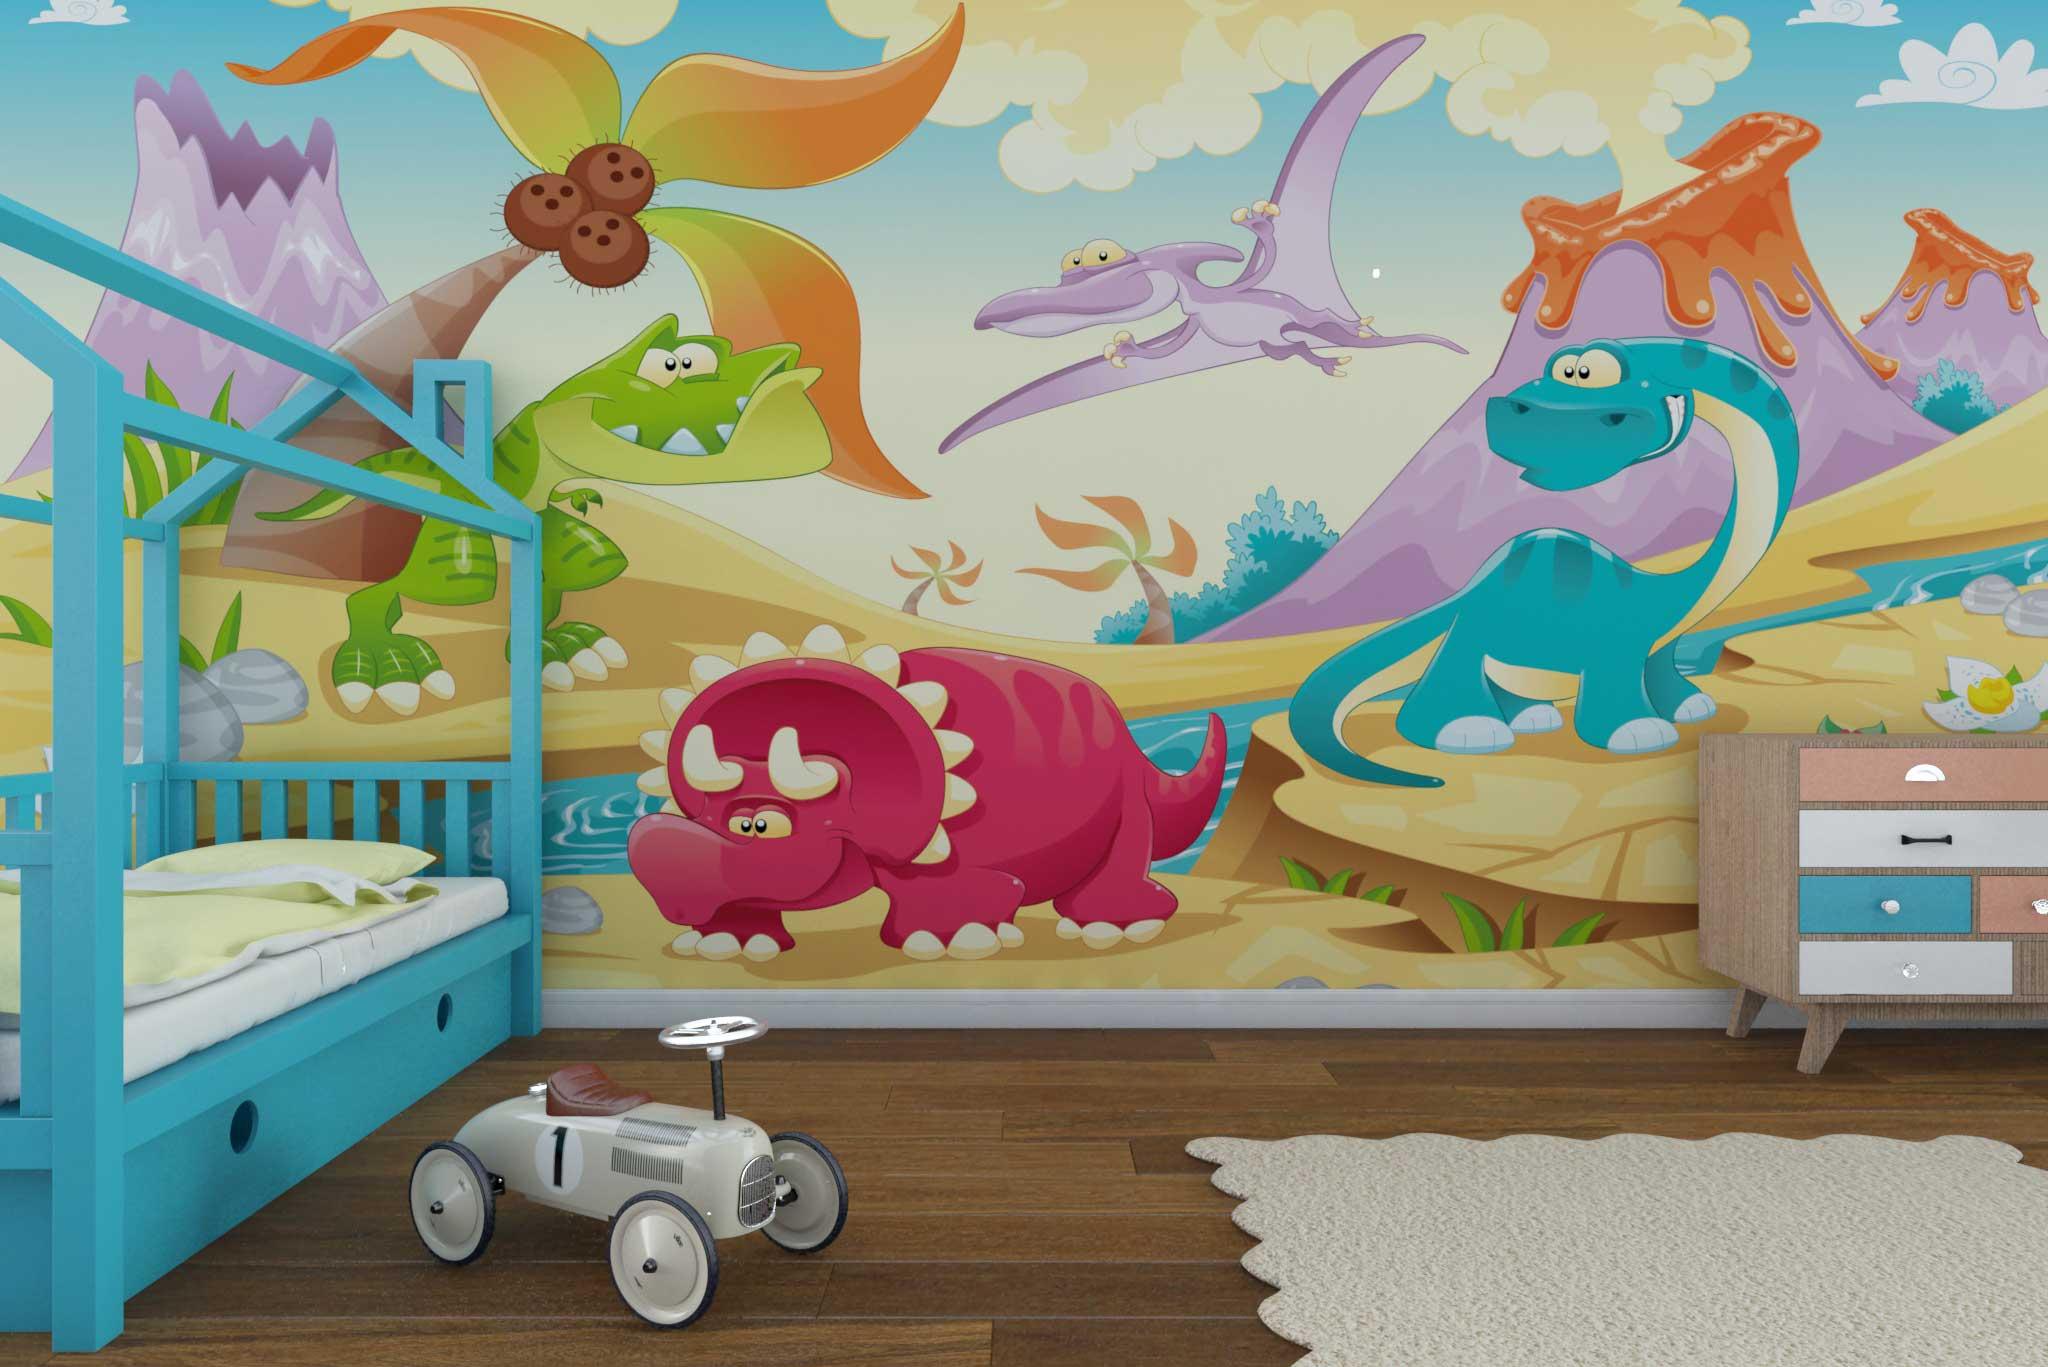 tapet-fototapet-comanda-personalizat-bucuresti-camera-dormitor-copii-model-desen-dinozauri-multicolor